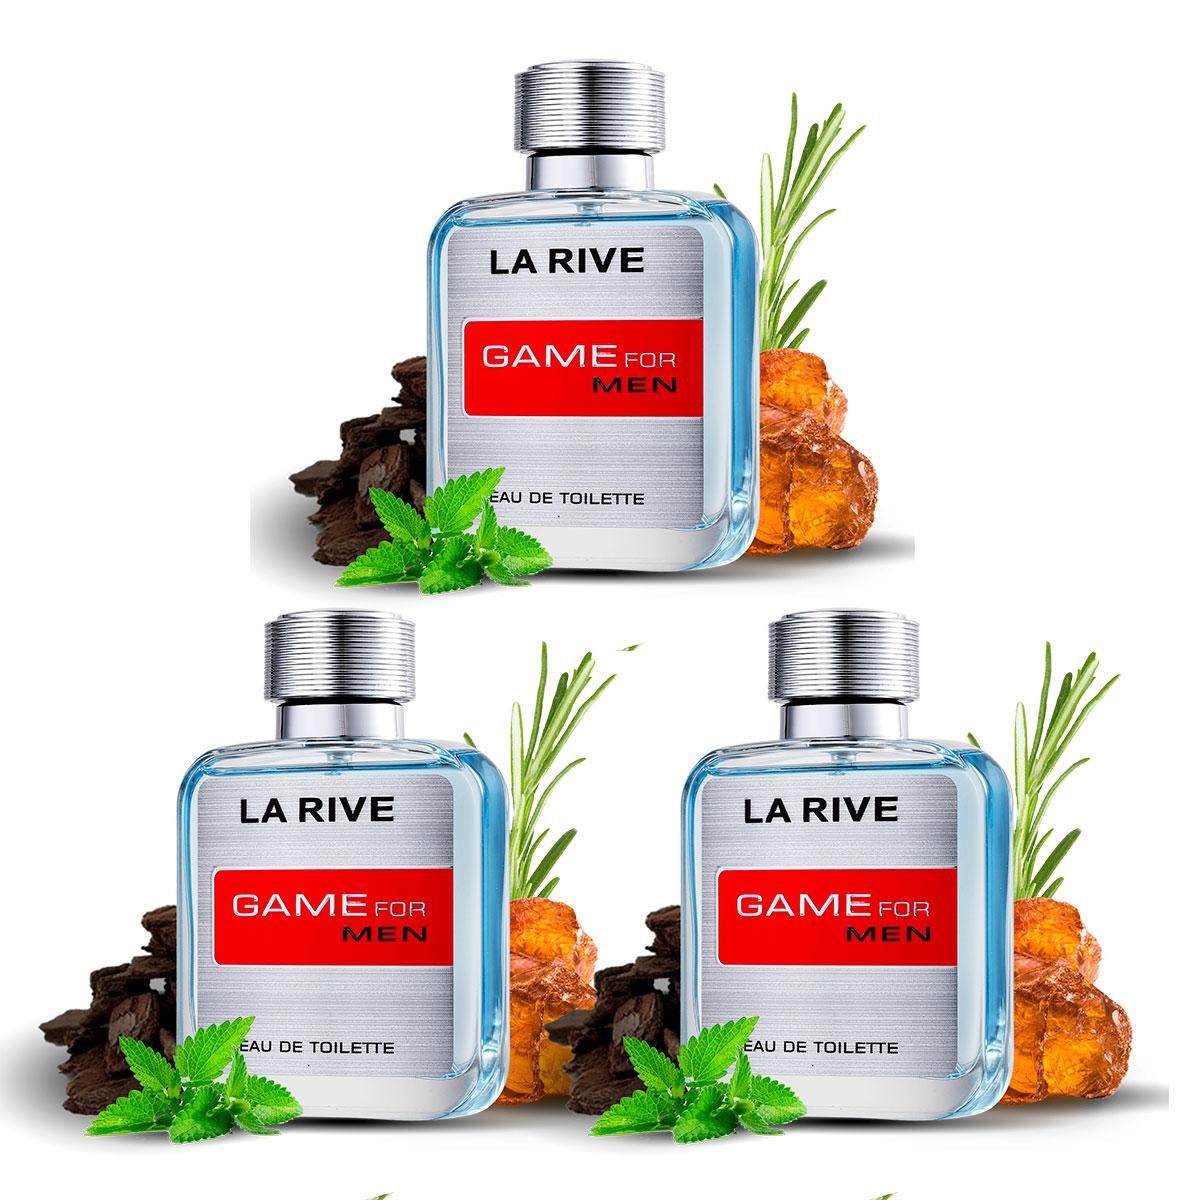 Kit 3 Perfumes Importados Masculinos Game for Men La Rive